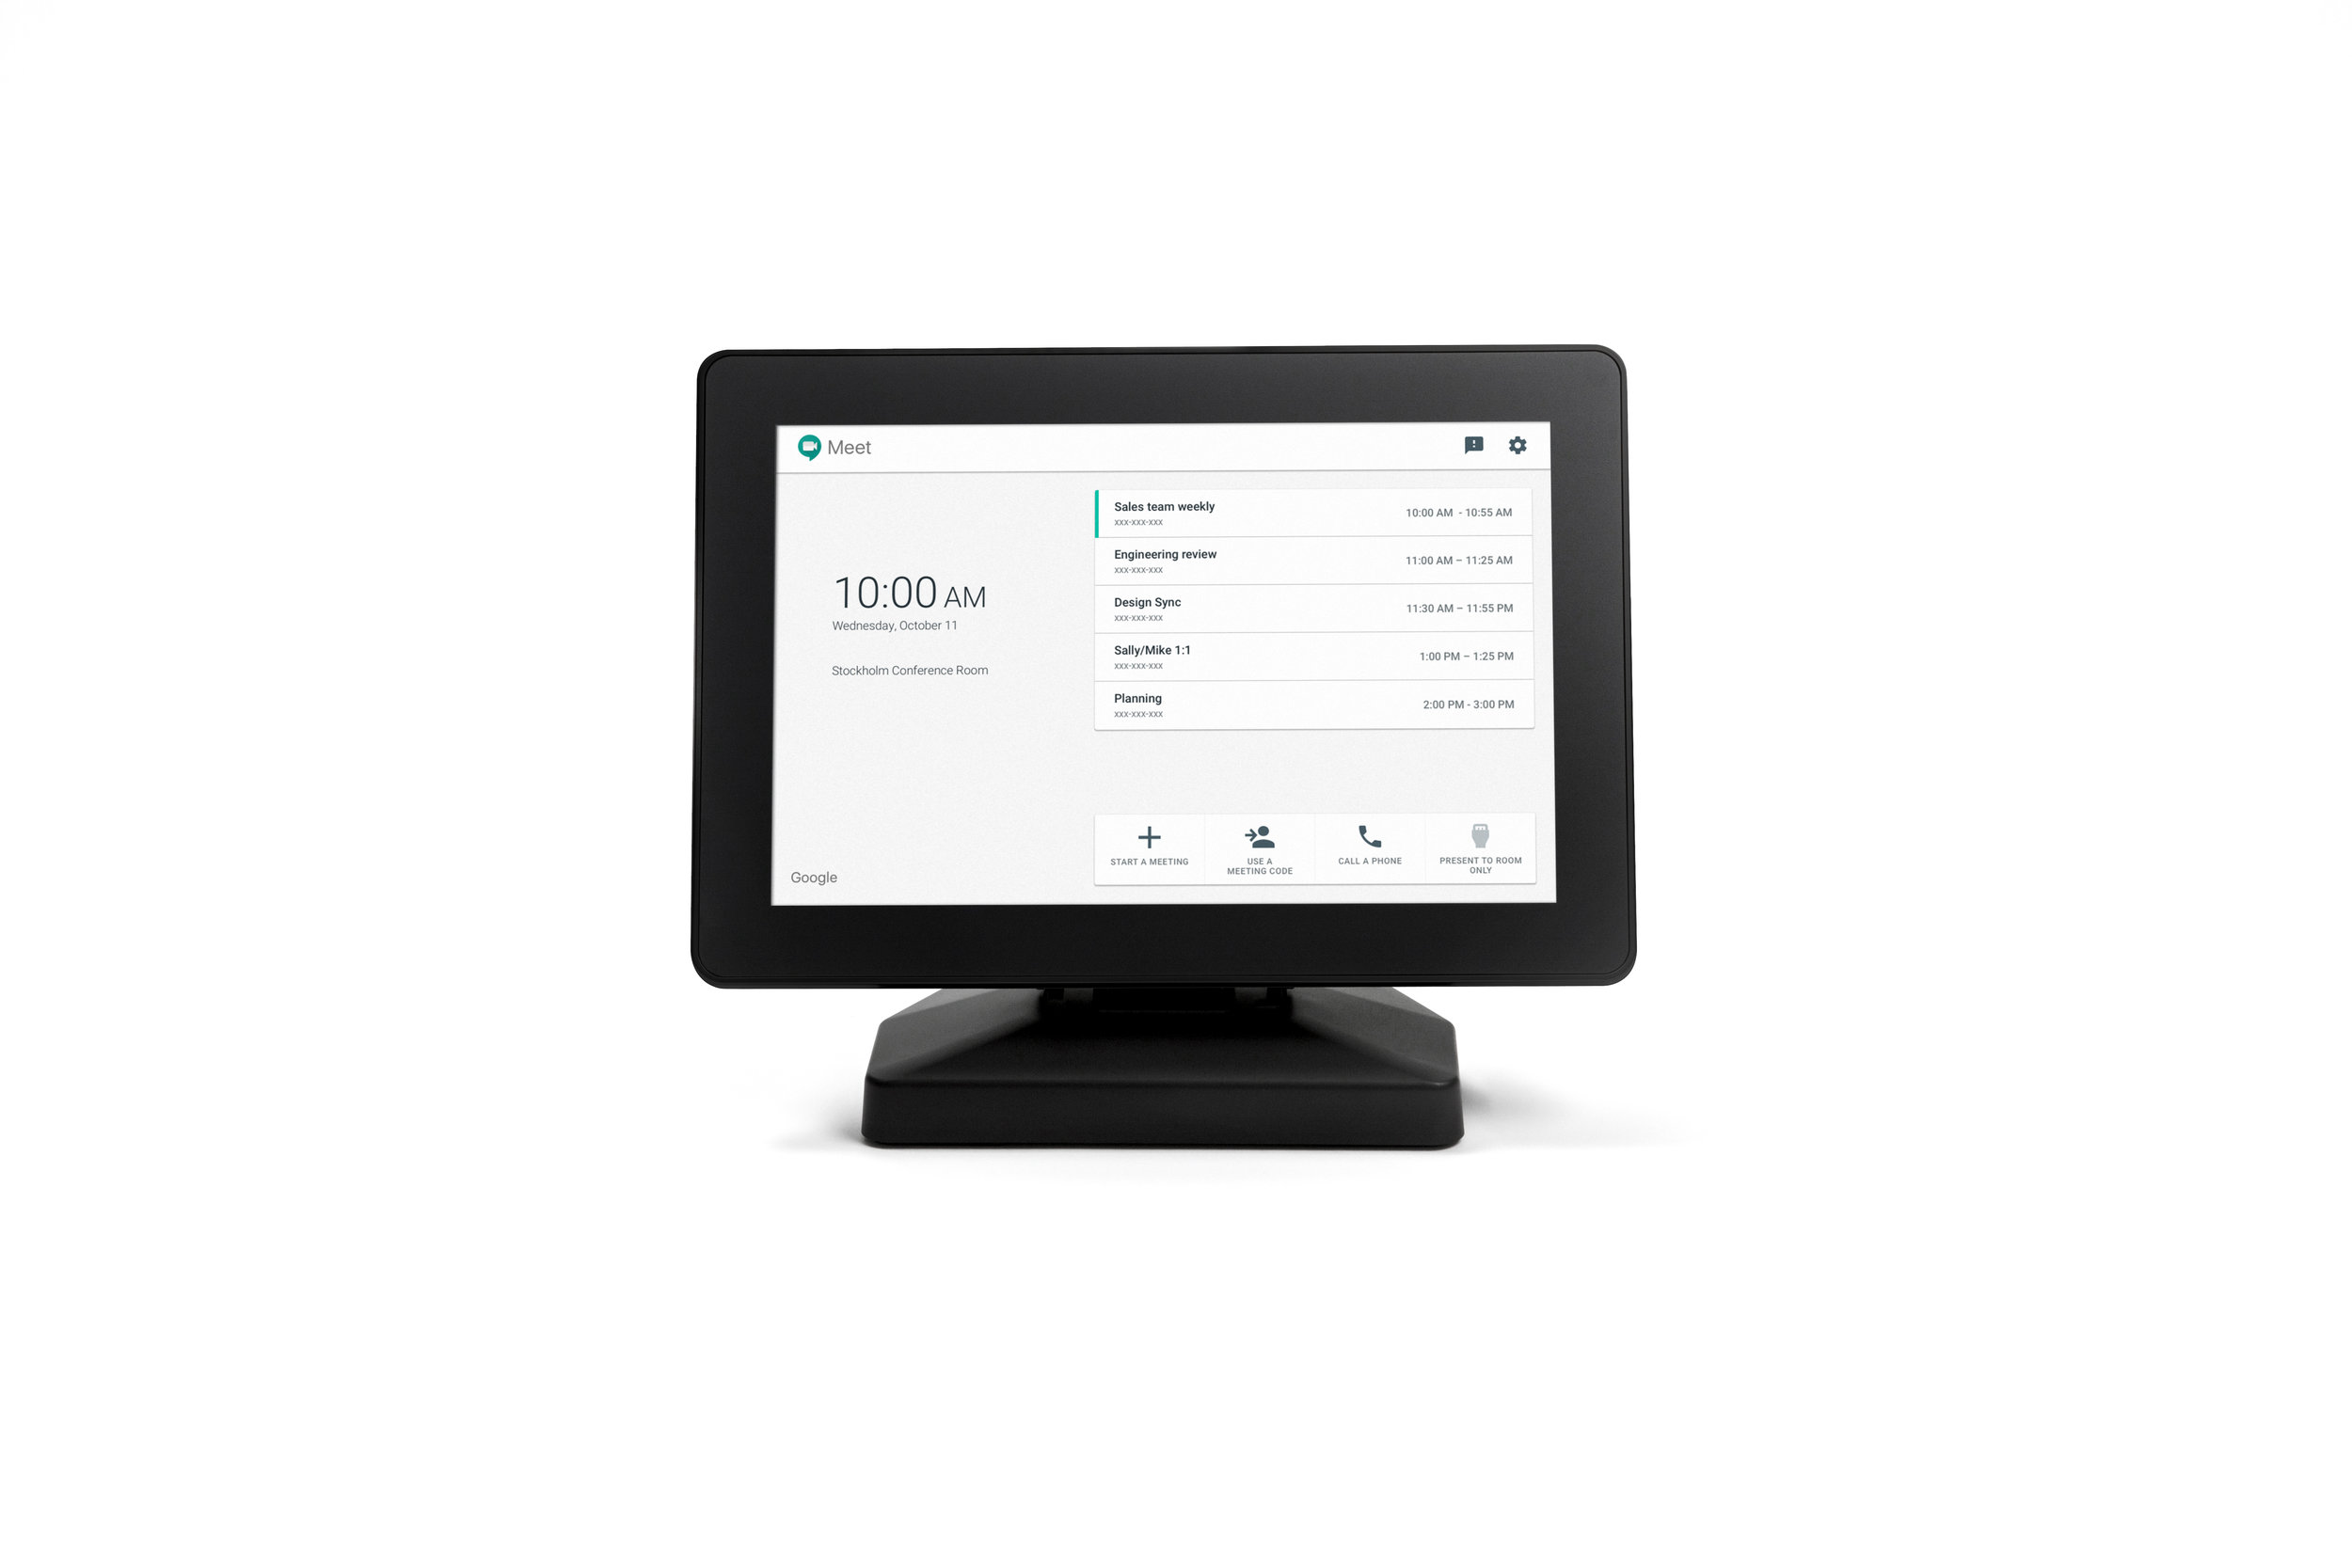 Tablet_Front_01_UI_BLACK (1).jpg